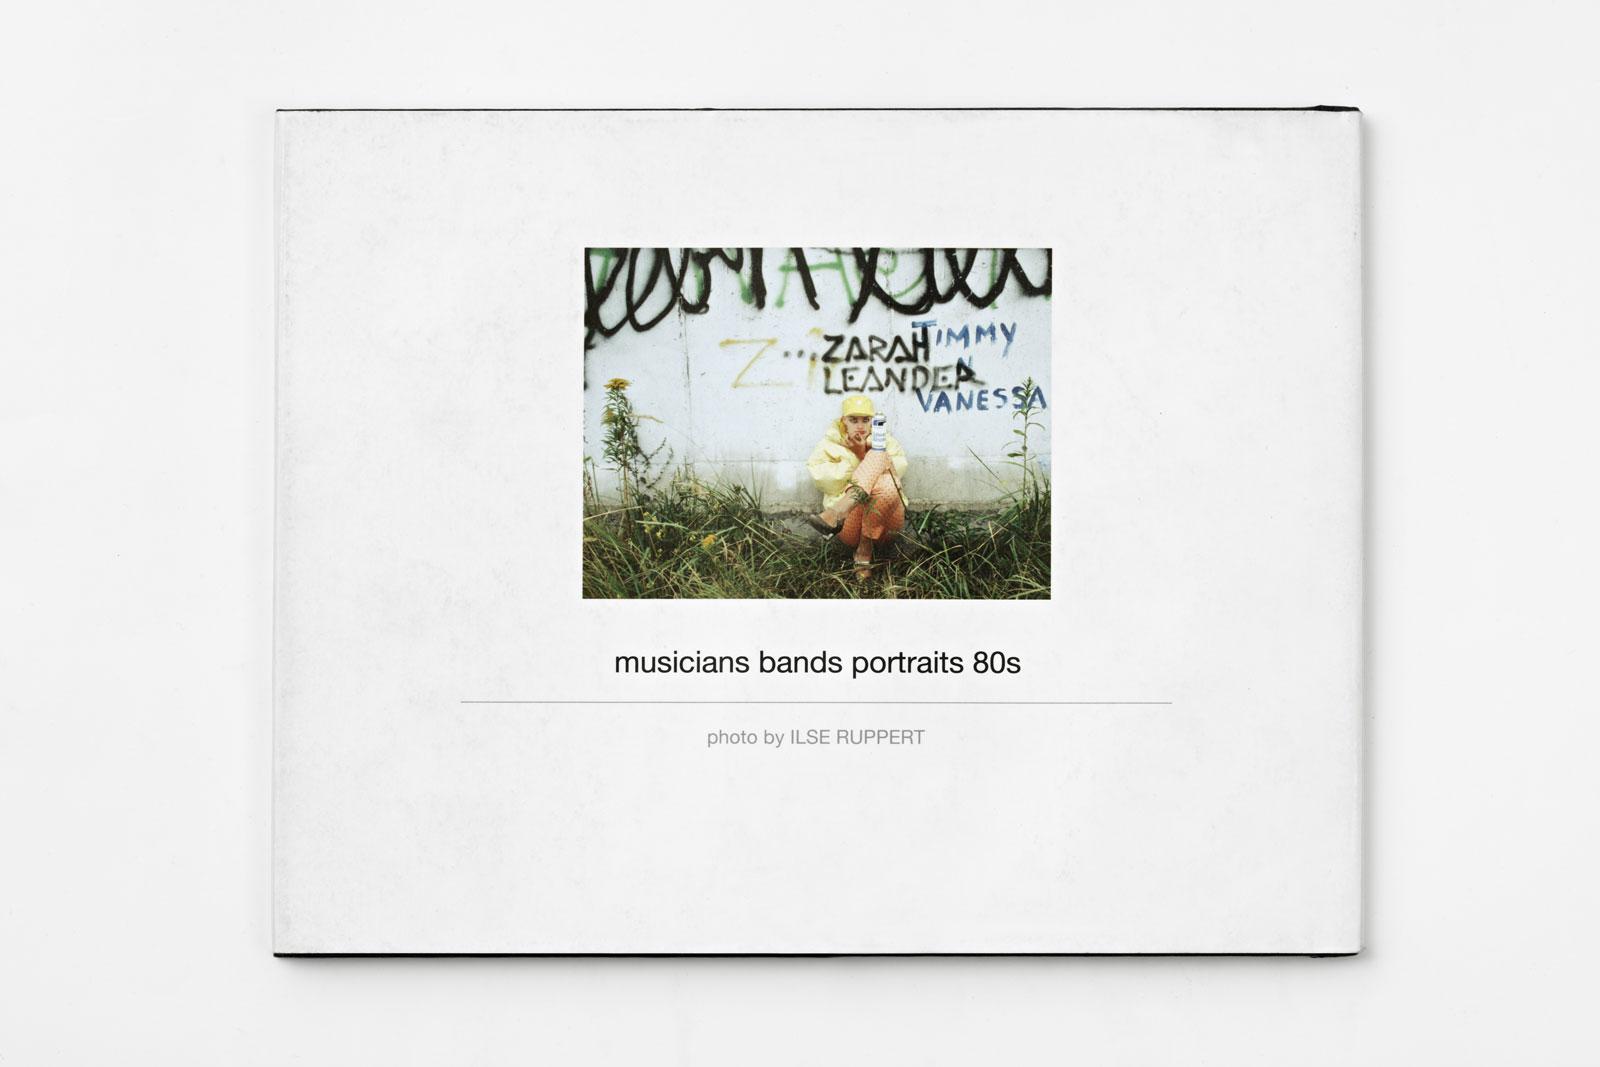 Ruppert, Ilse - musicians bands Portraits 80s - 19??